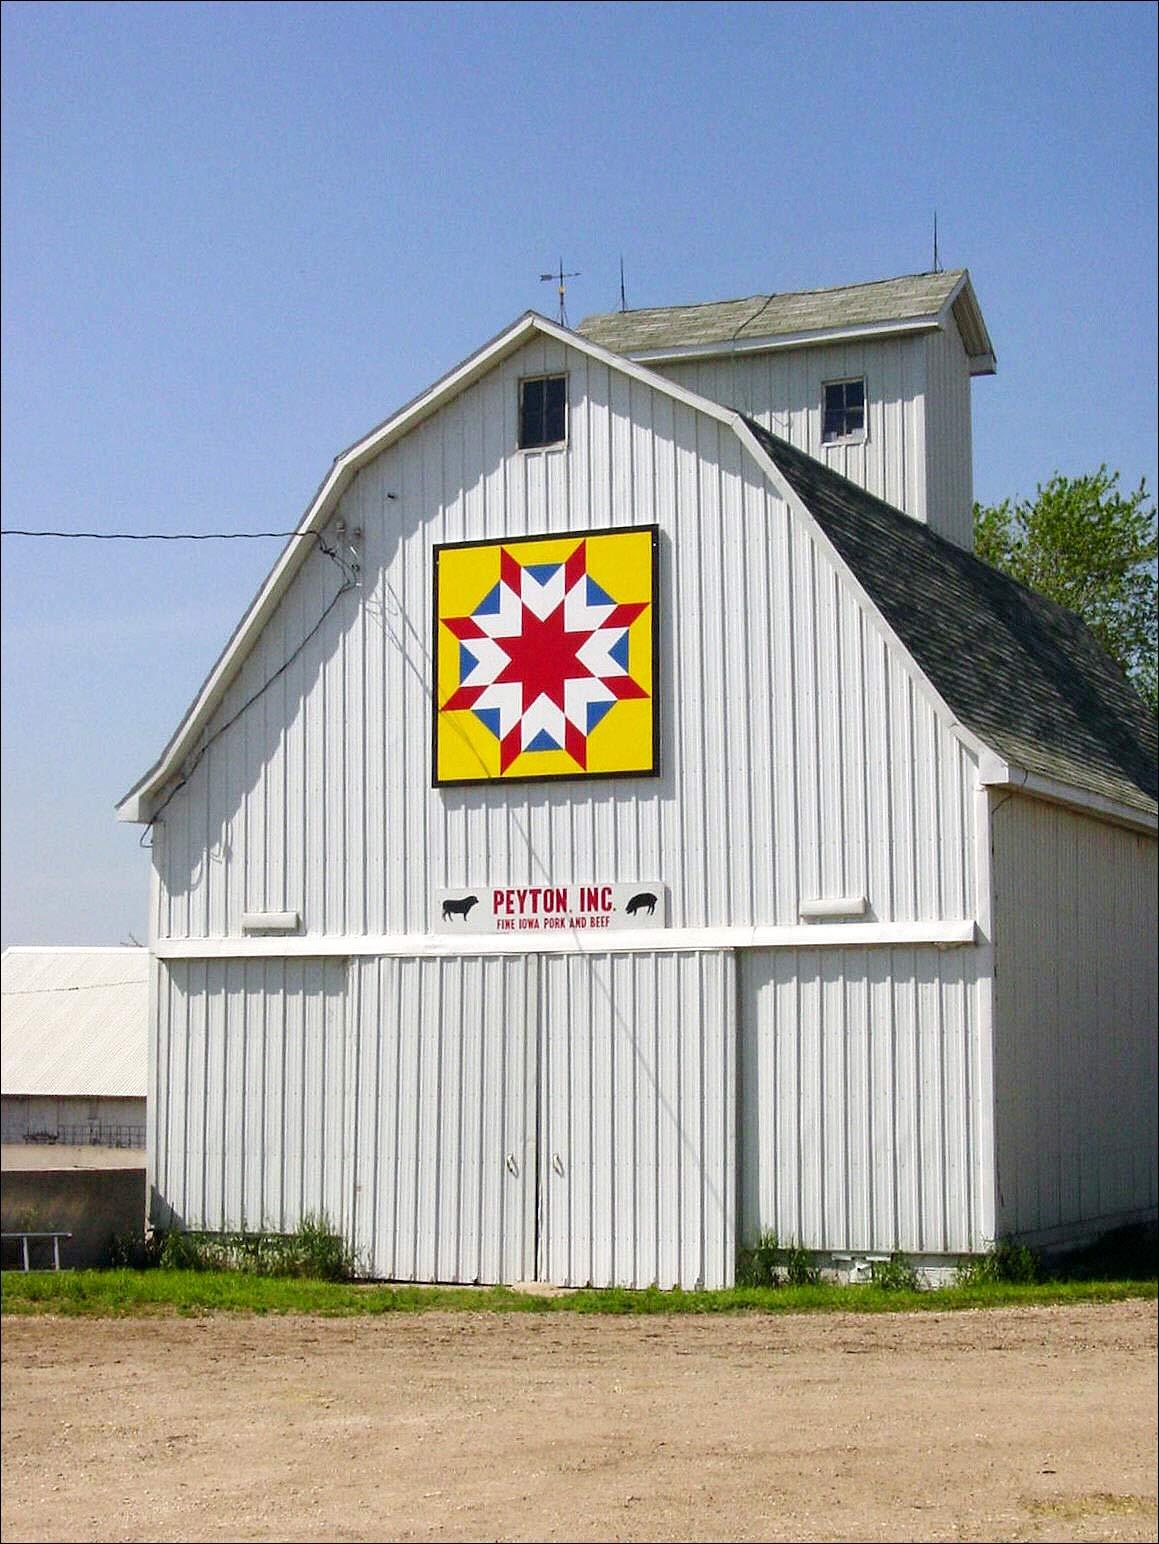 Barn quilt in Iowa - via barnquilts.com